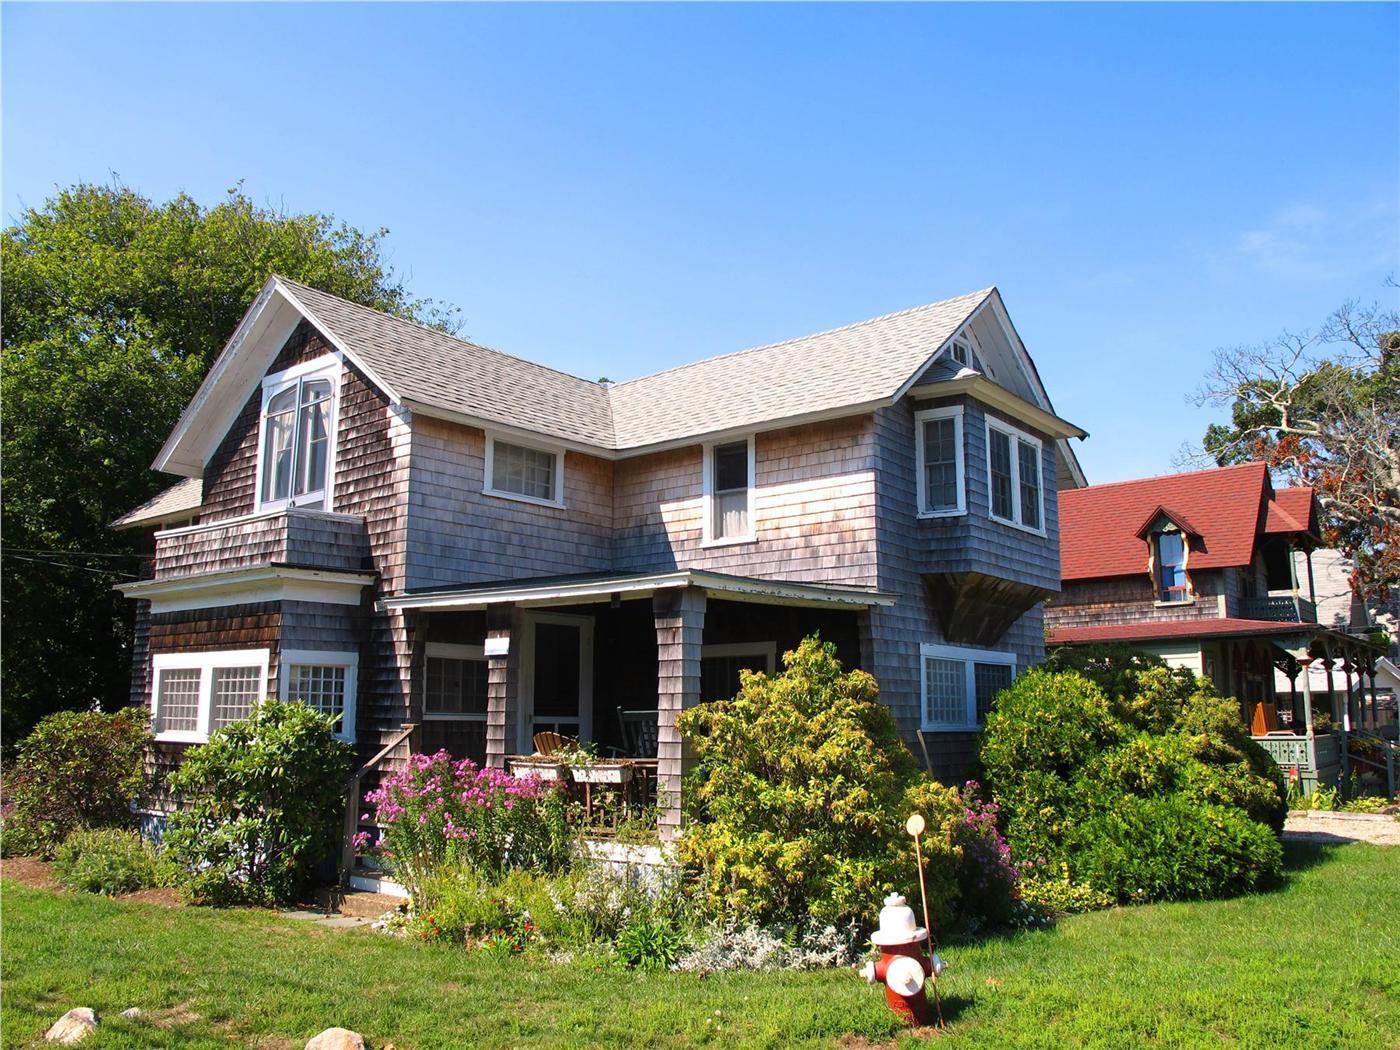 Oak Bluffs Vacation Rental Home In Martha S Vineyard Ma 02557 Two